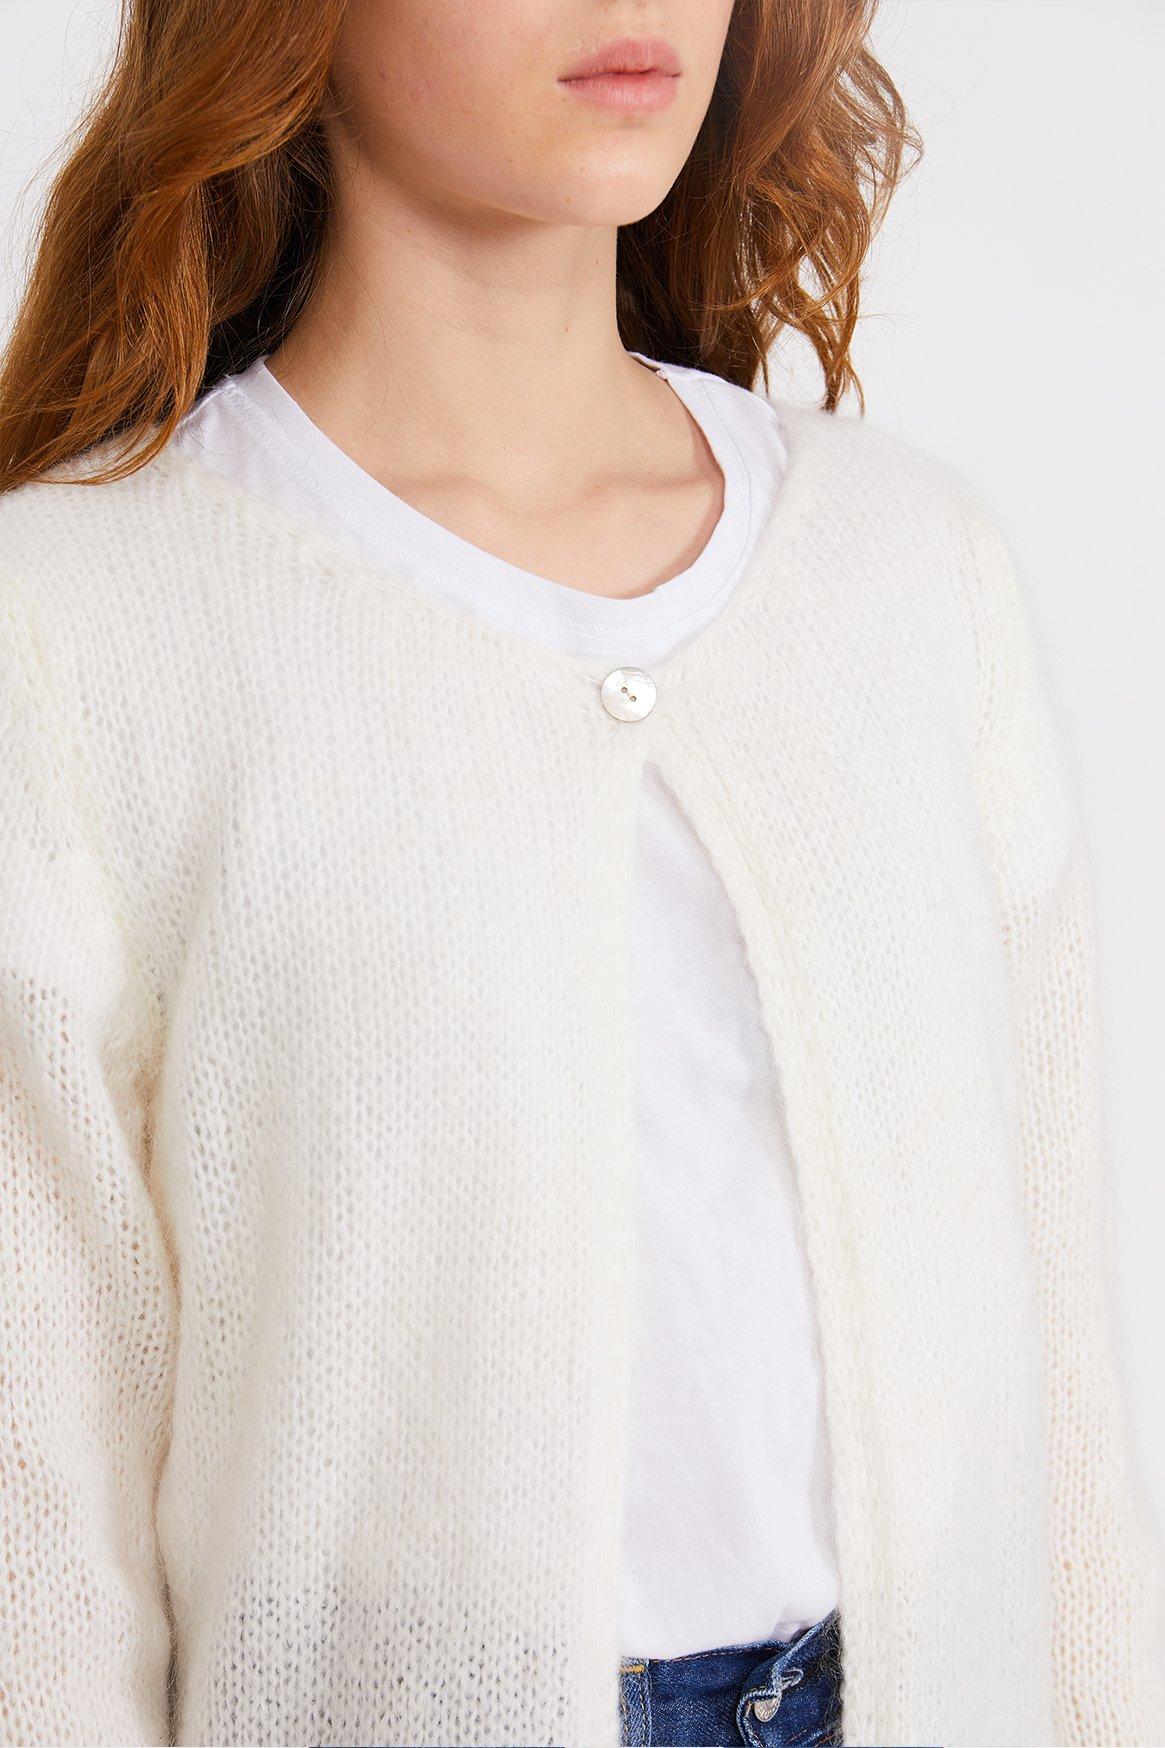 Image of White Cardigan Sweater